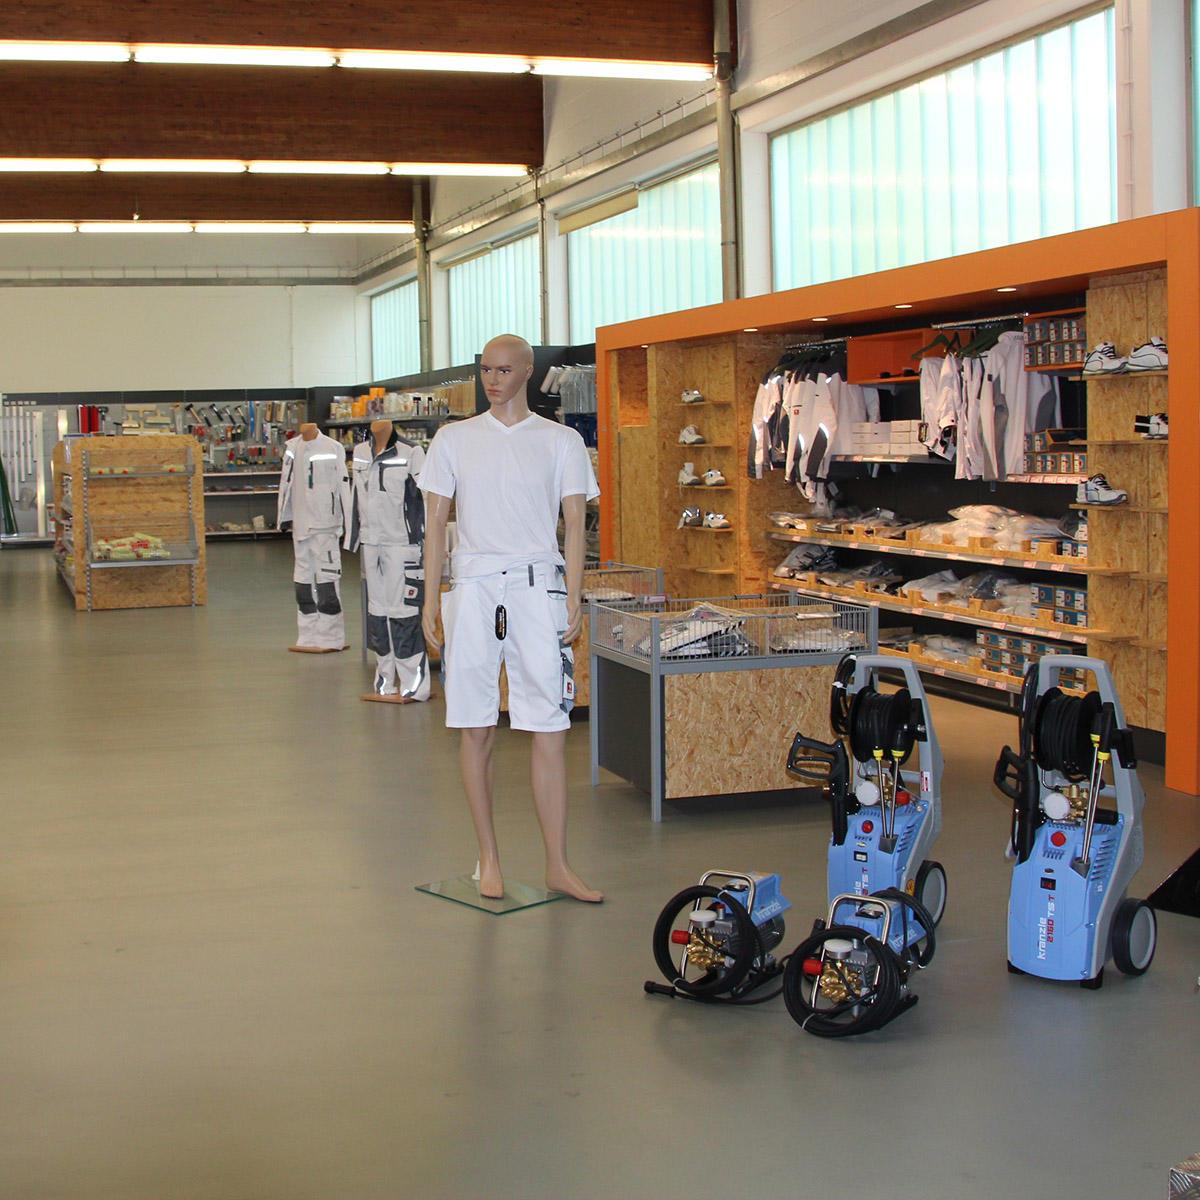 Späth Knoll GmbH